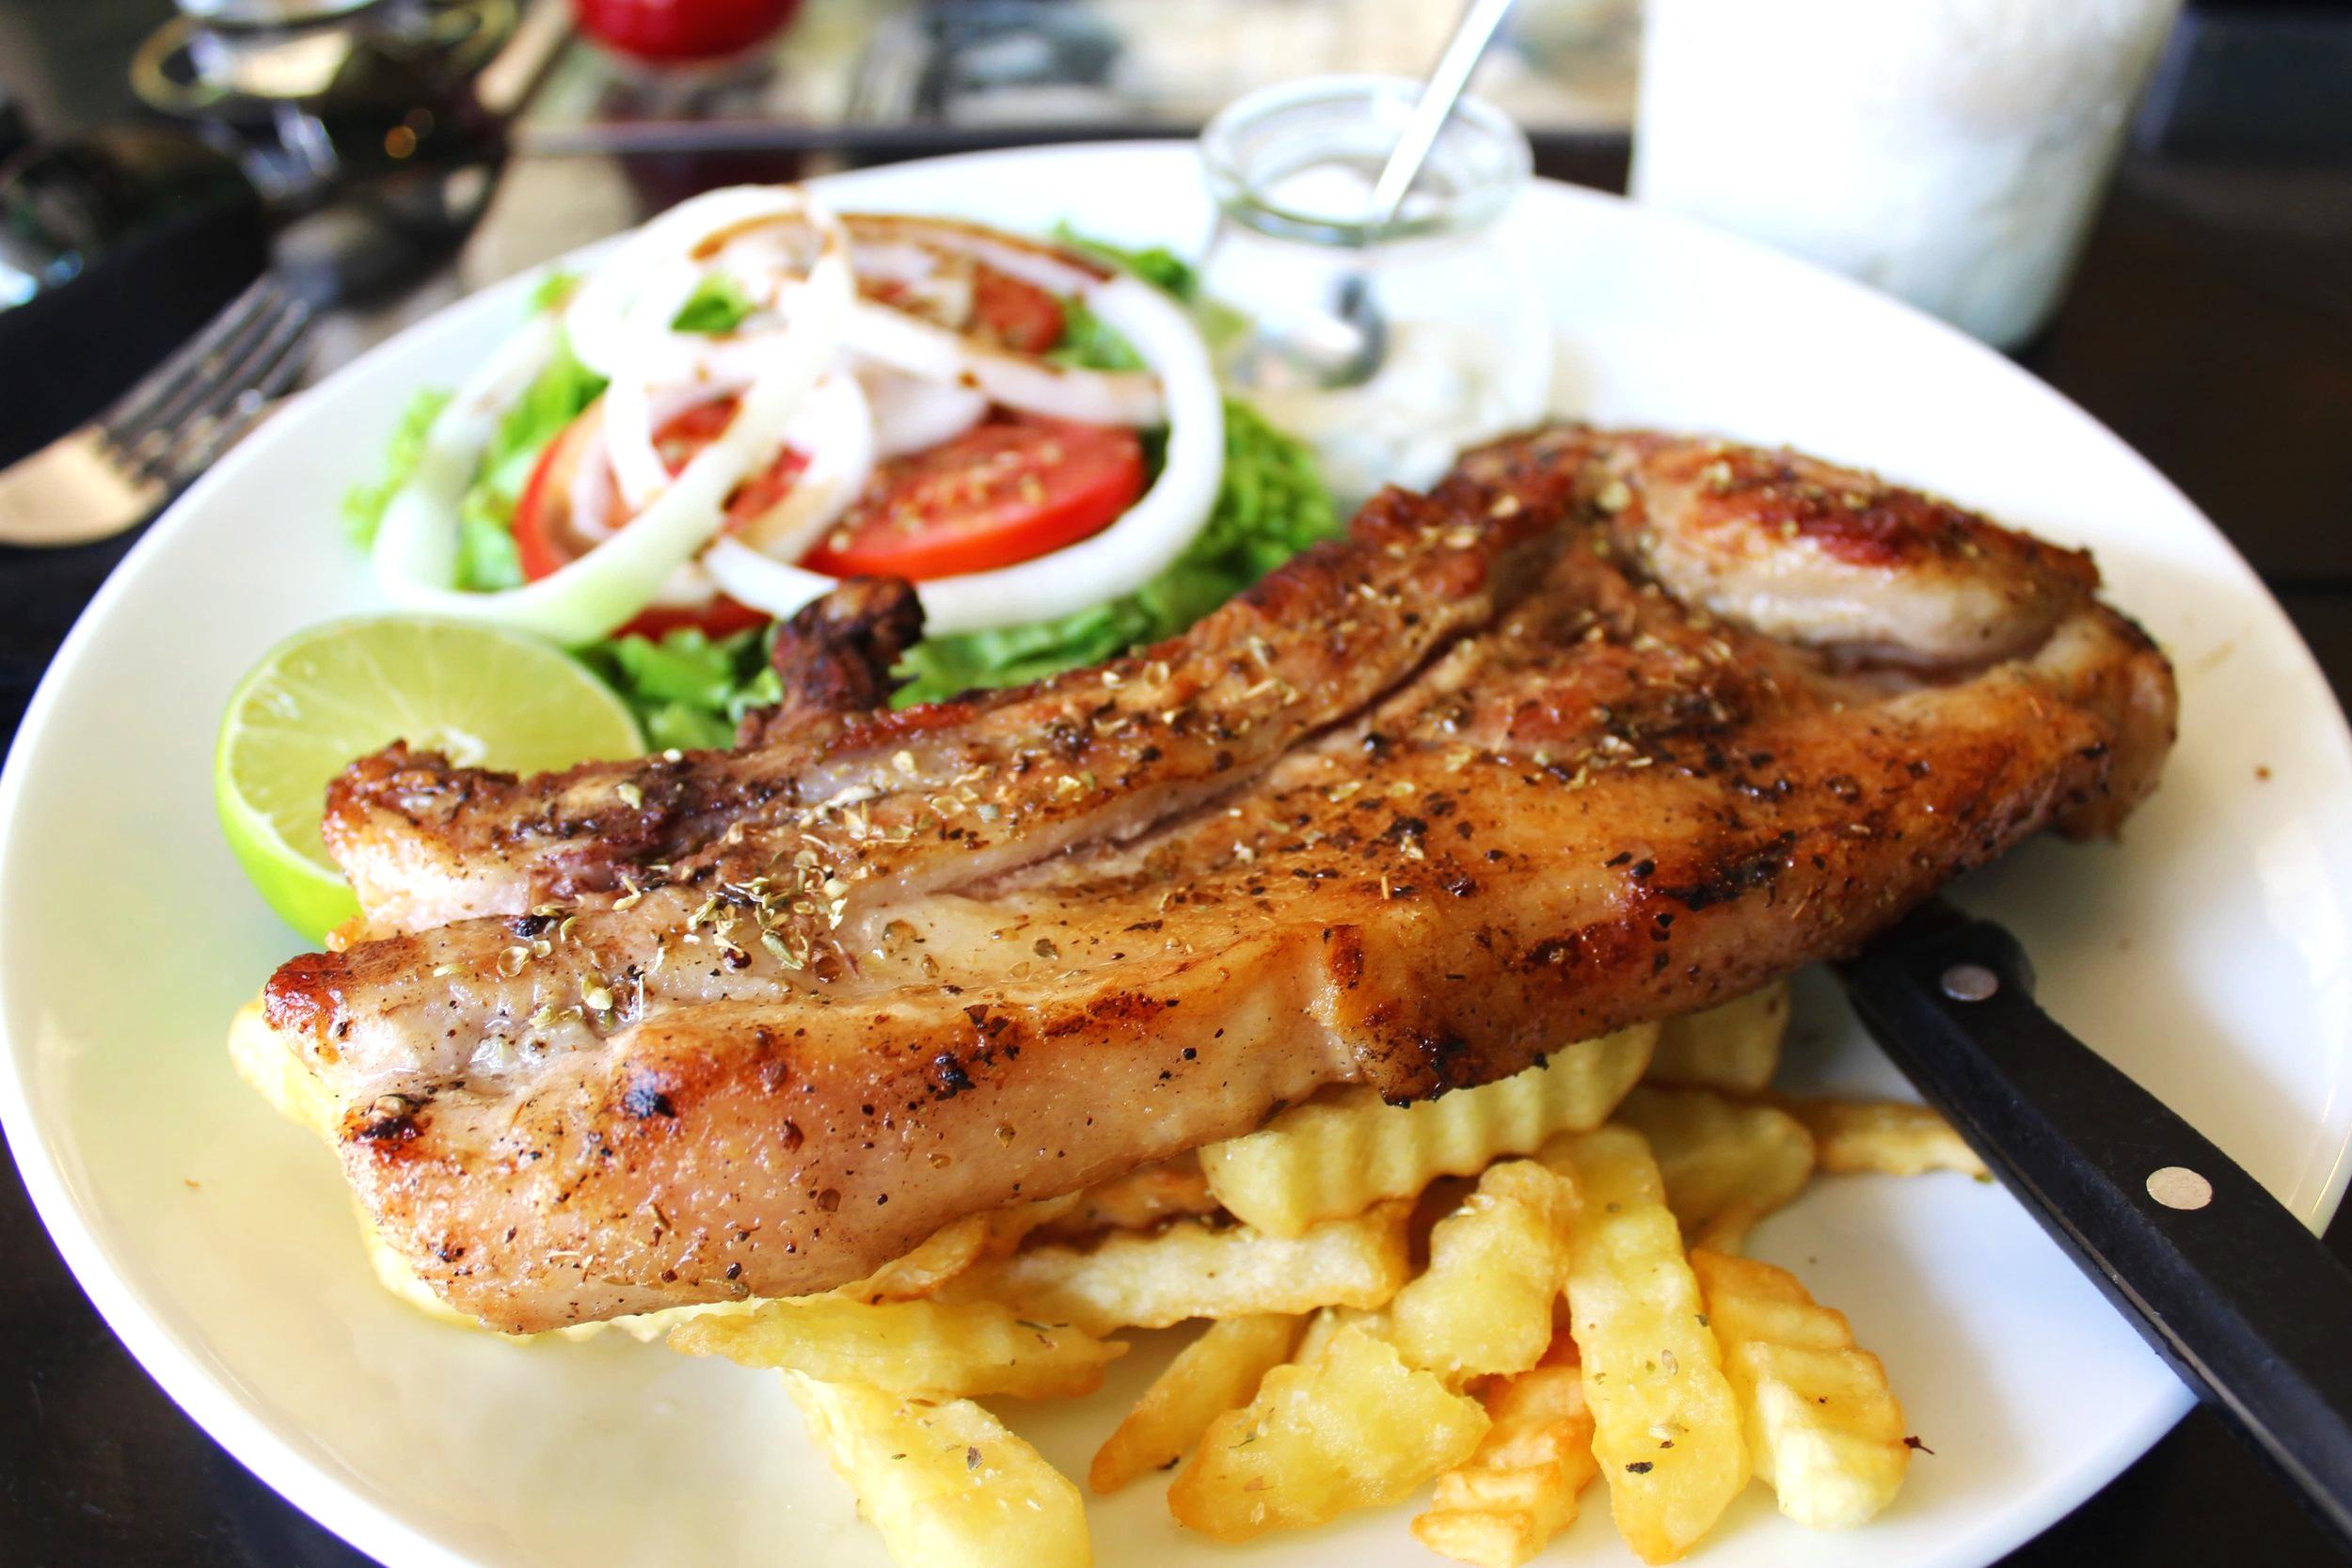 The Mighty Pork Britzola